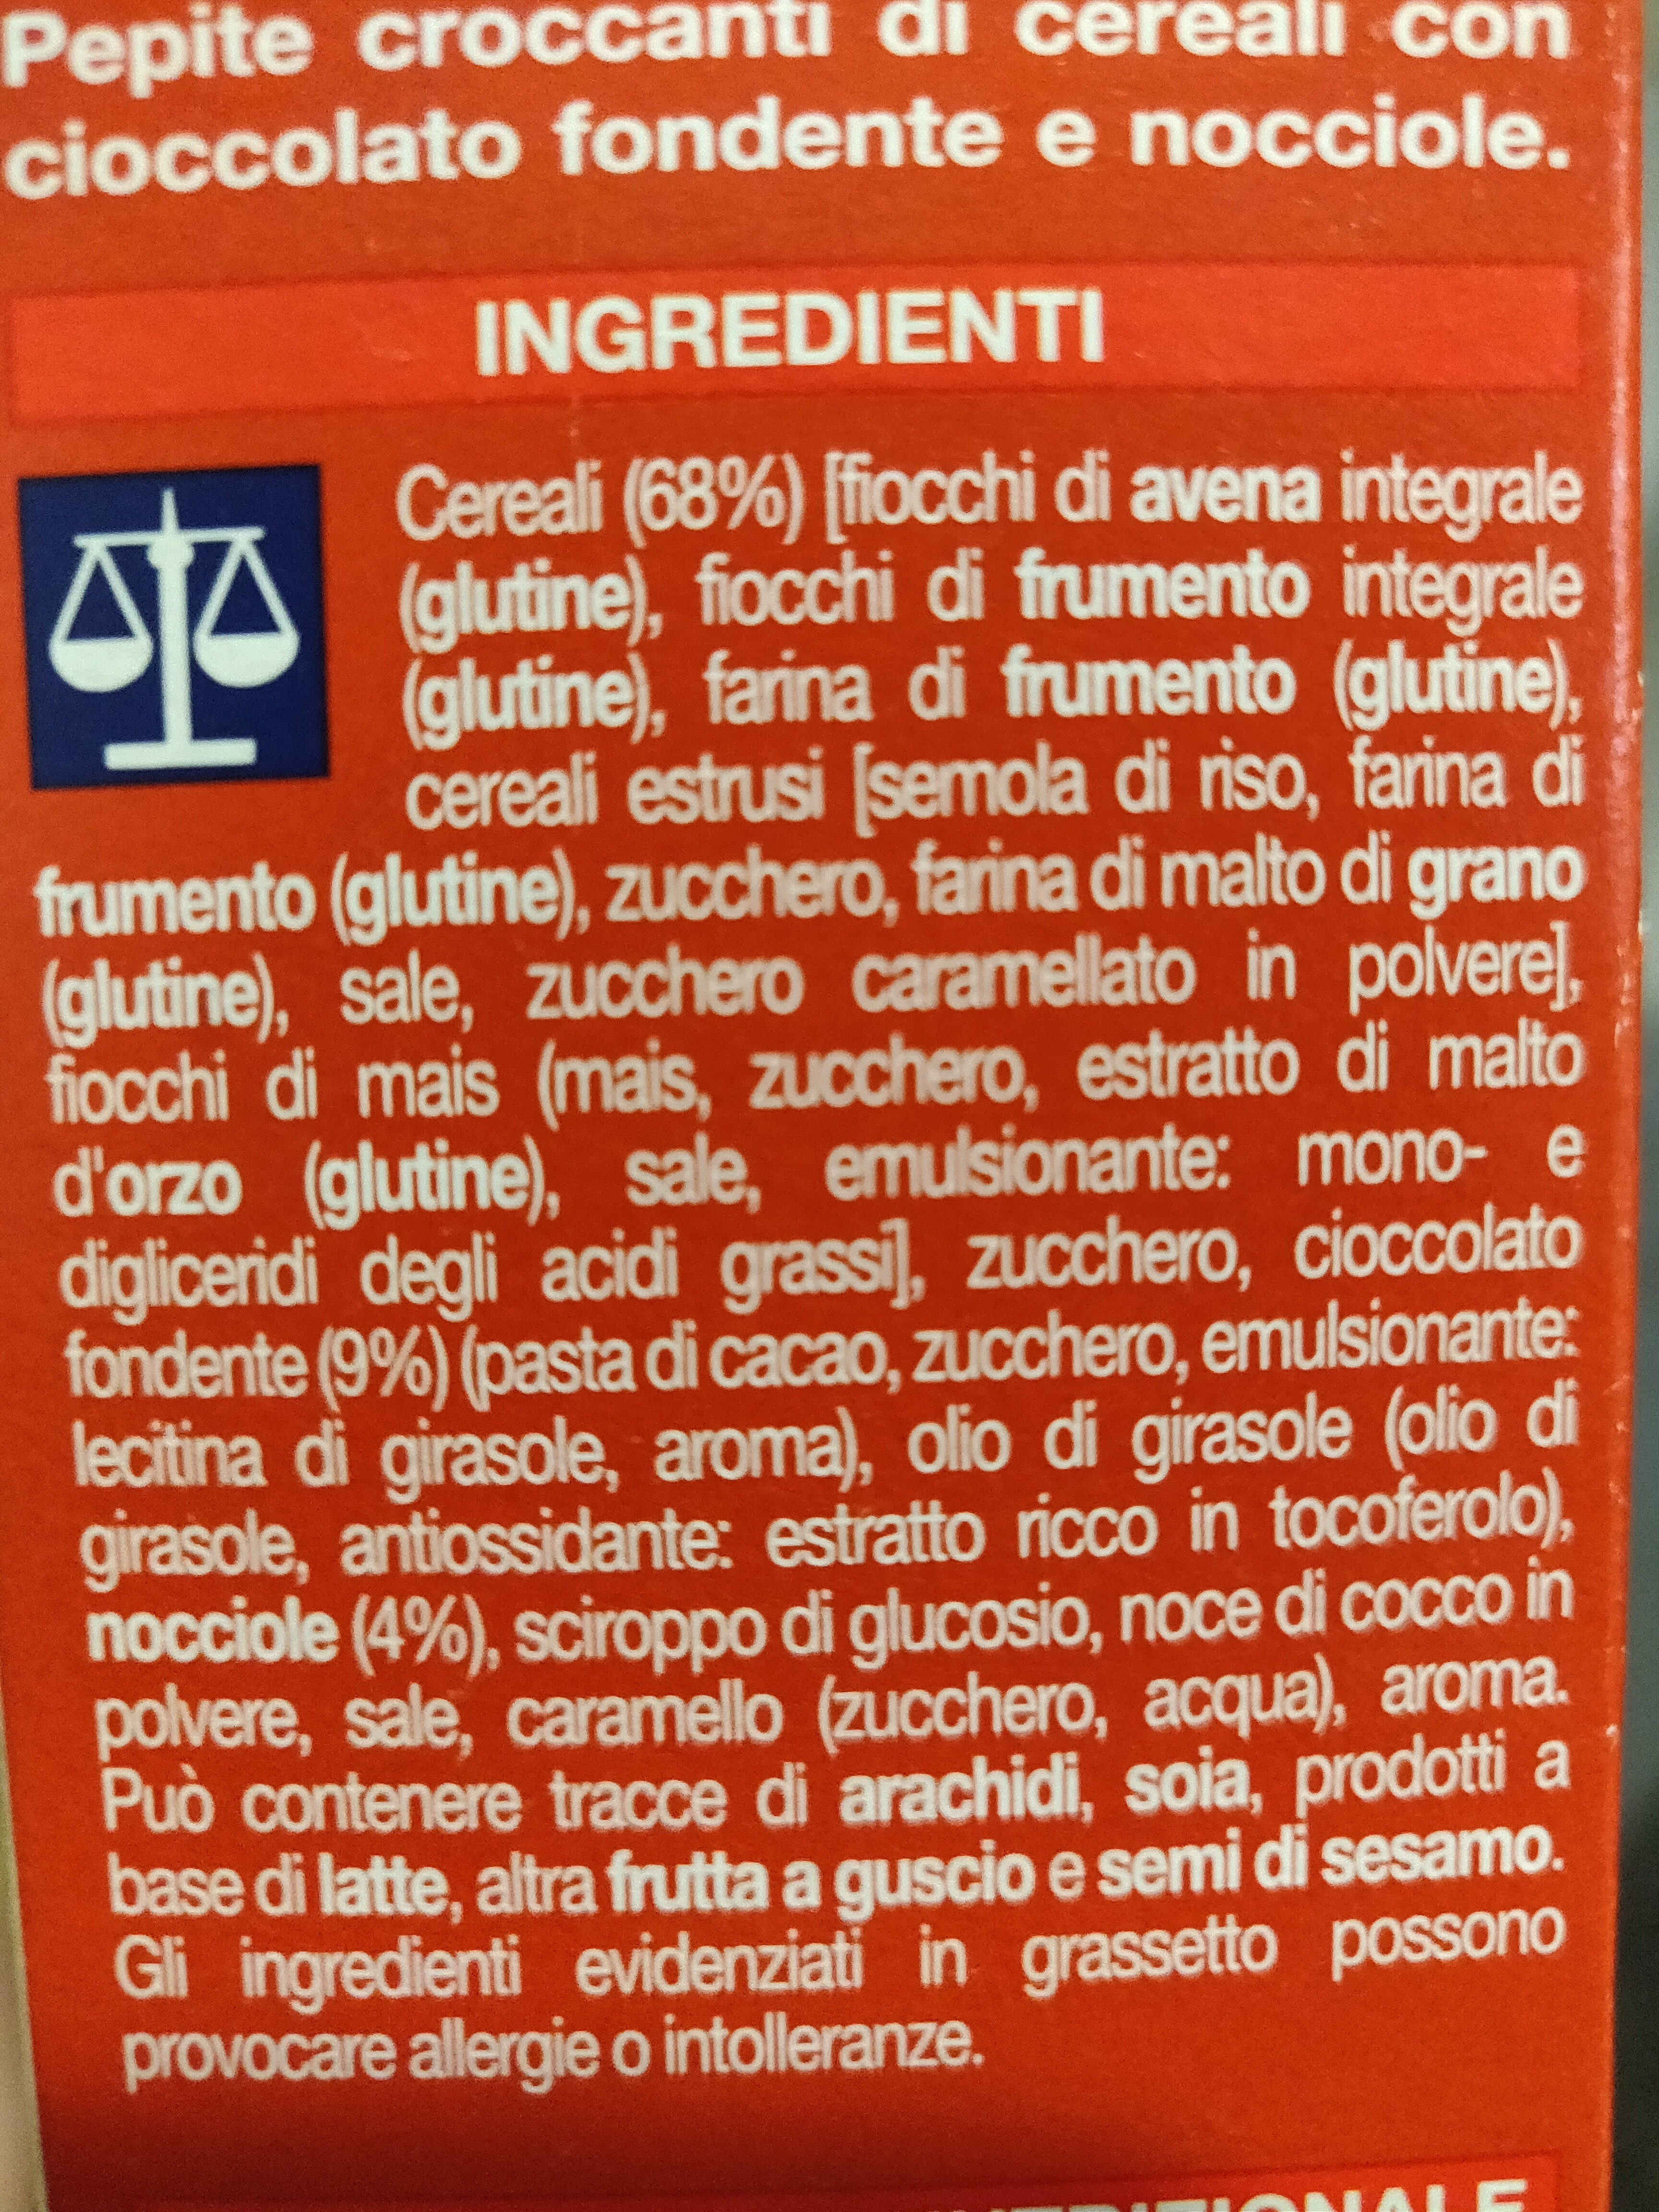 Cereali croccanti - Ingredients - it